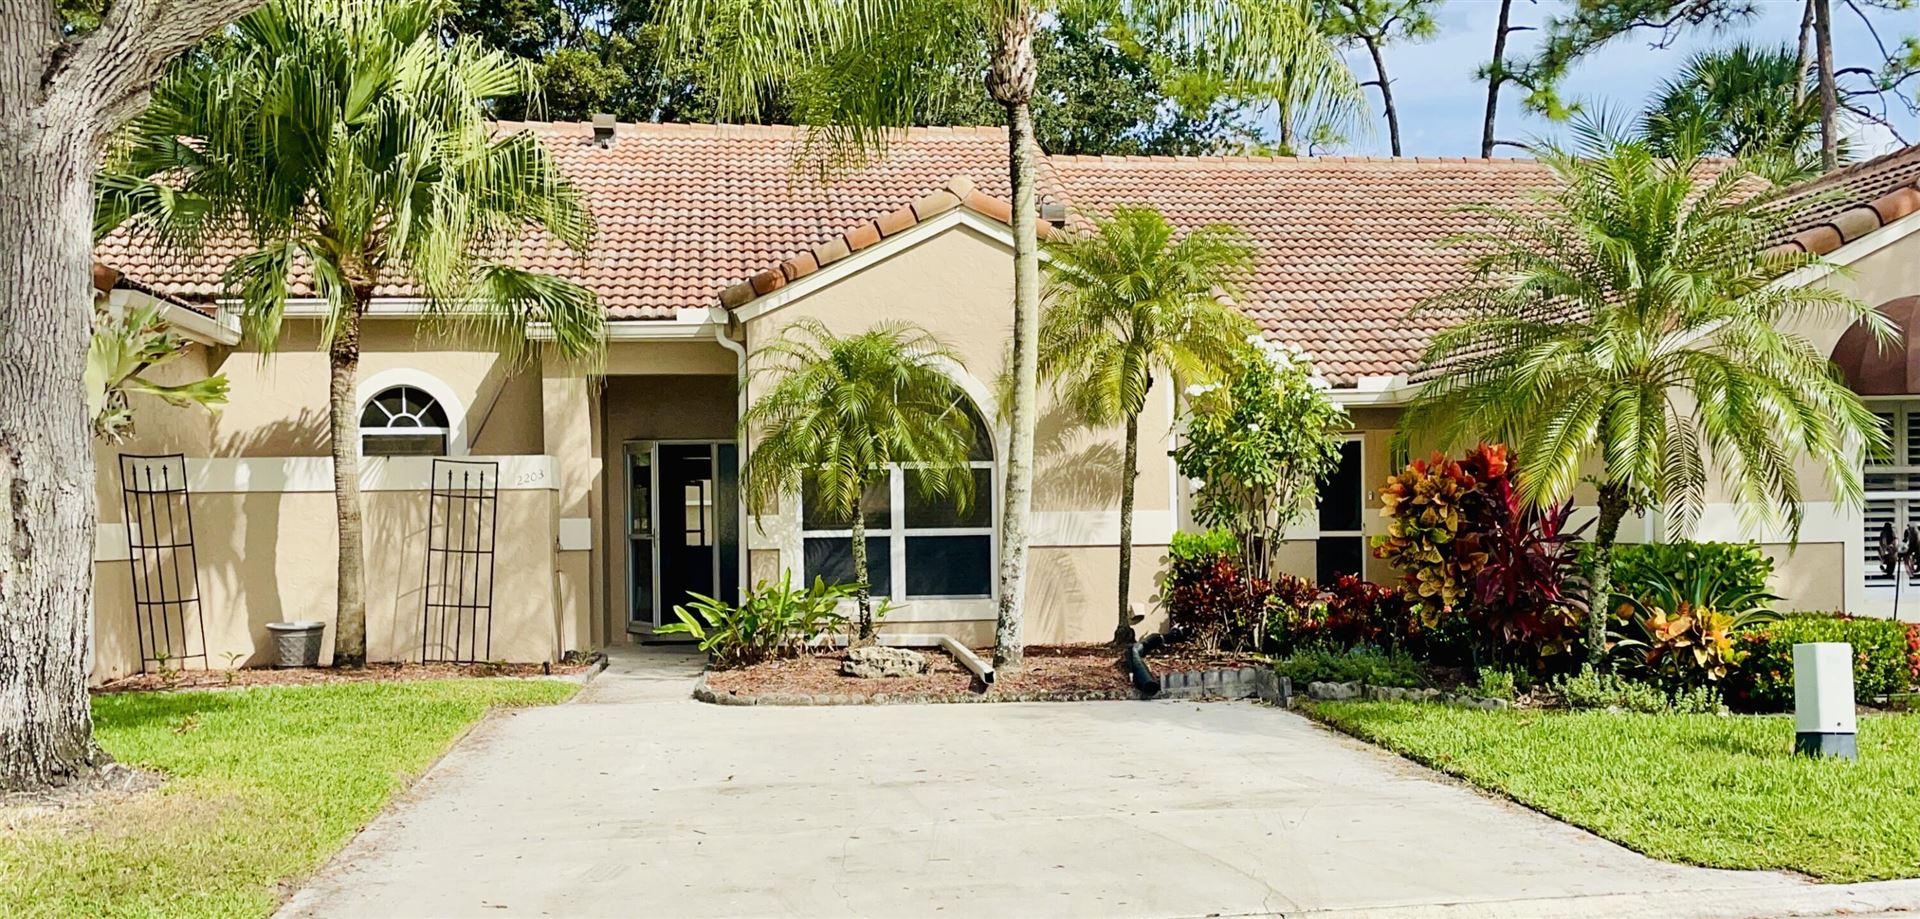 2203 Heather Run Terrace, Palm Beach Gardens, FL 33418 - MLS#: RX-10731722